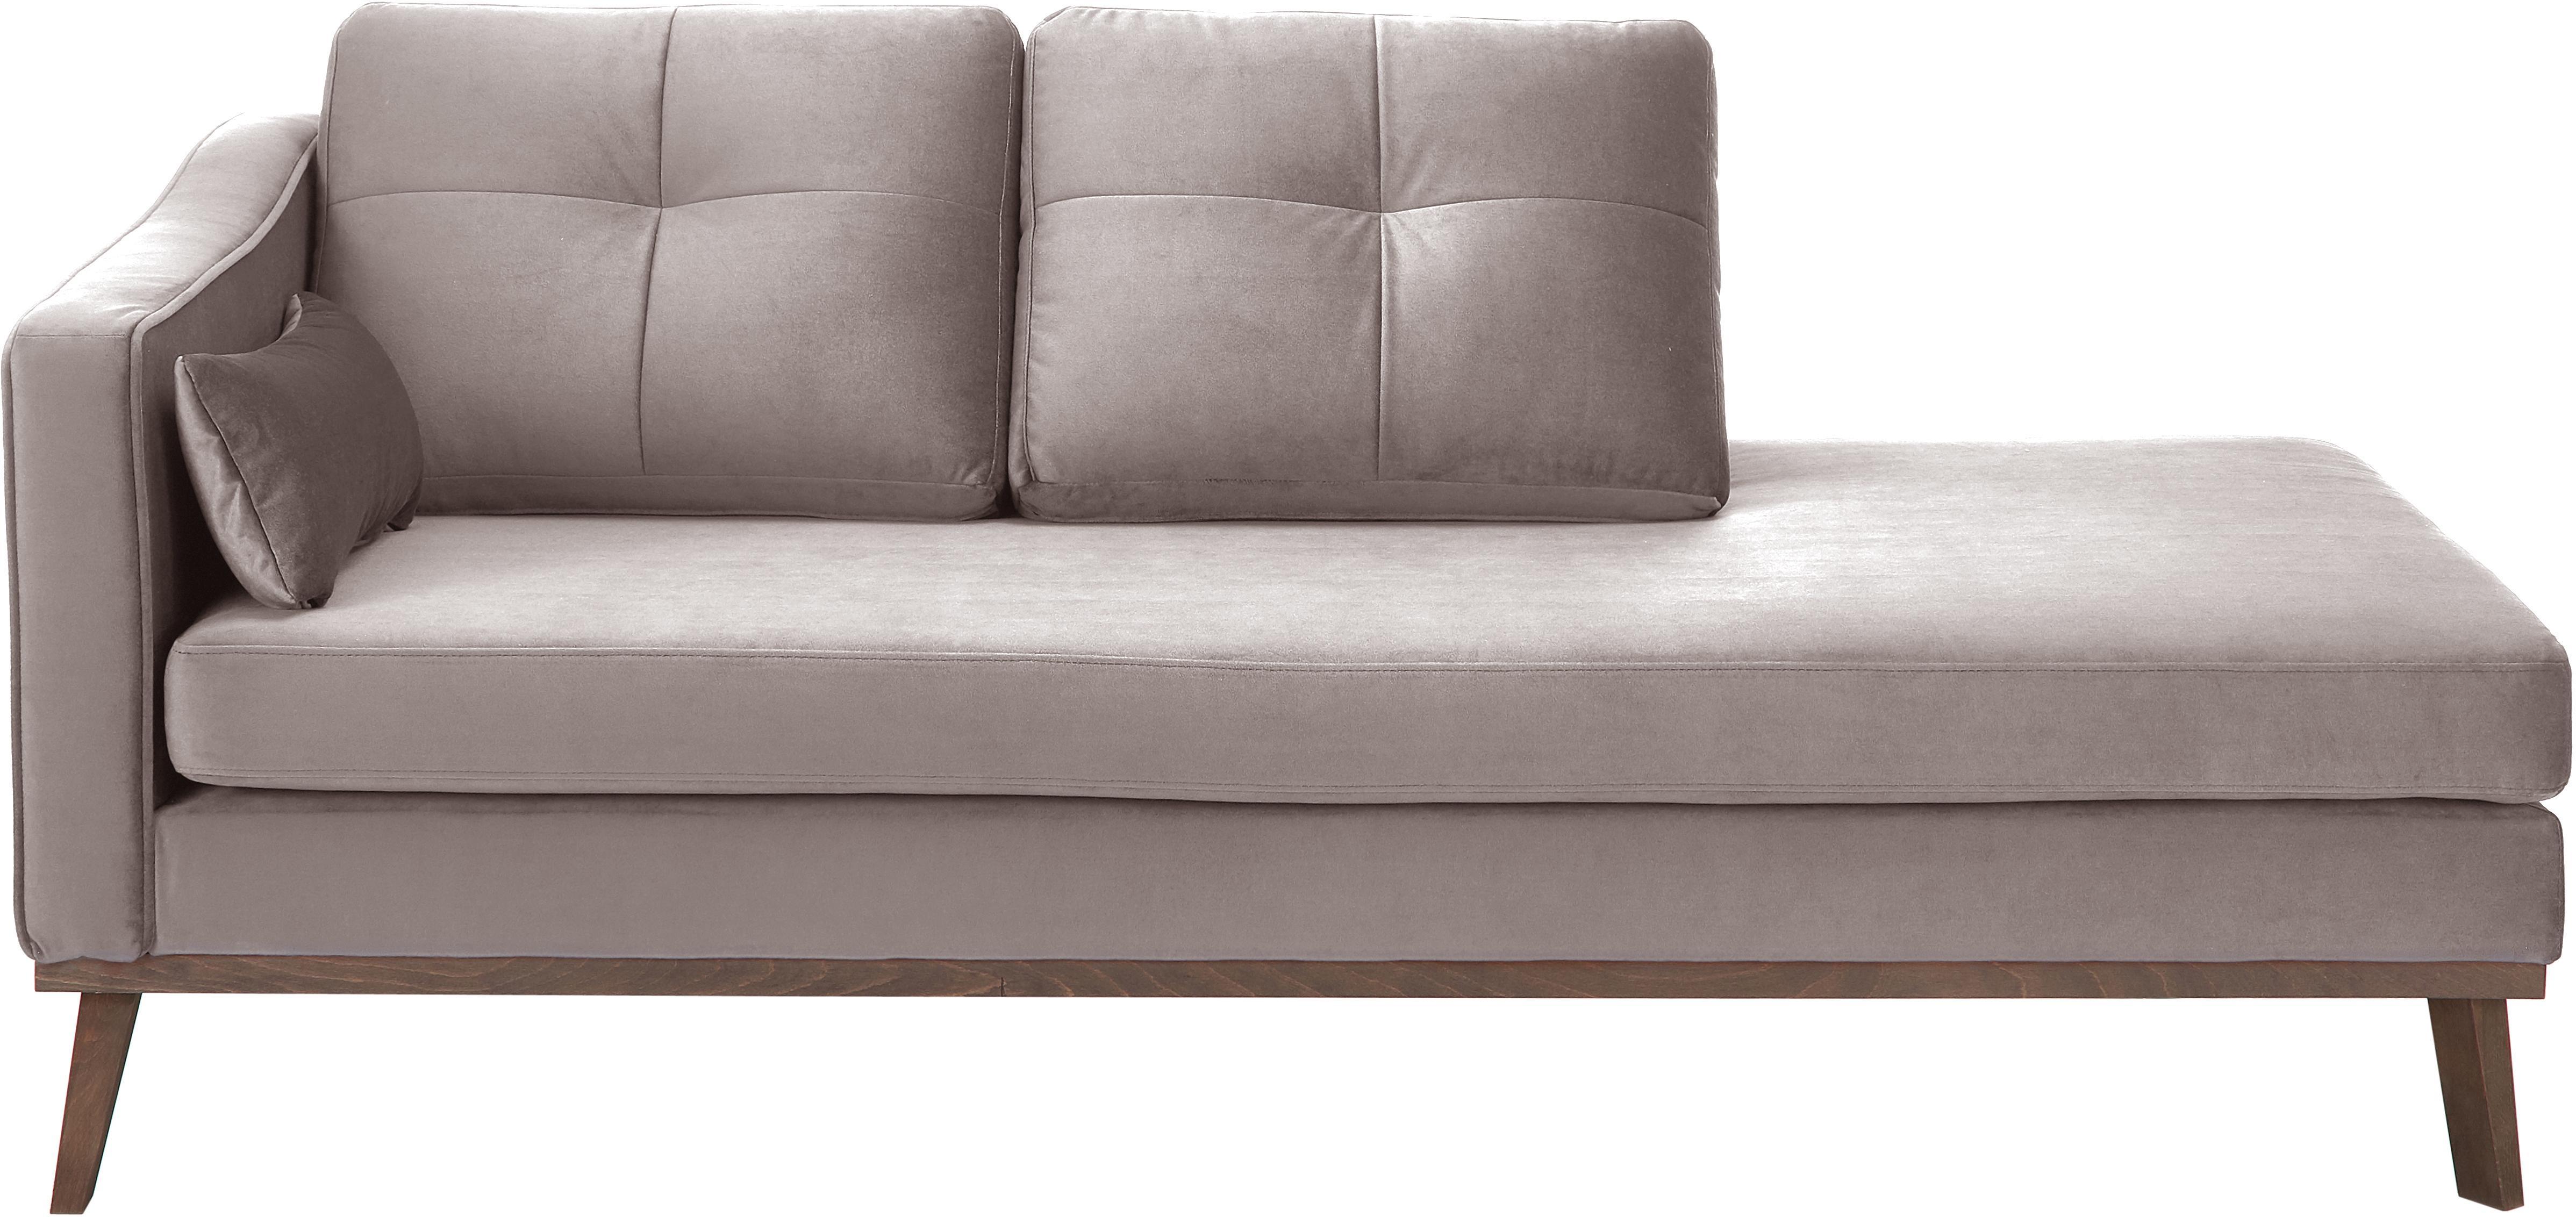 Fluwelen chaise longue Alva, Bekleding: fluweel (hoogwaardig poly, Frame: massief grenenhout, Poten: massief gebeitst beukenho, Taupe, B 193 x D 94 cm